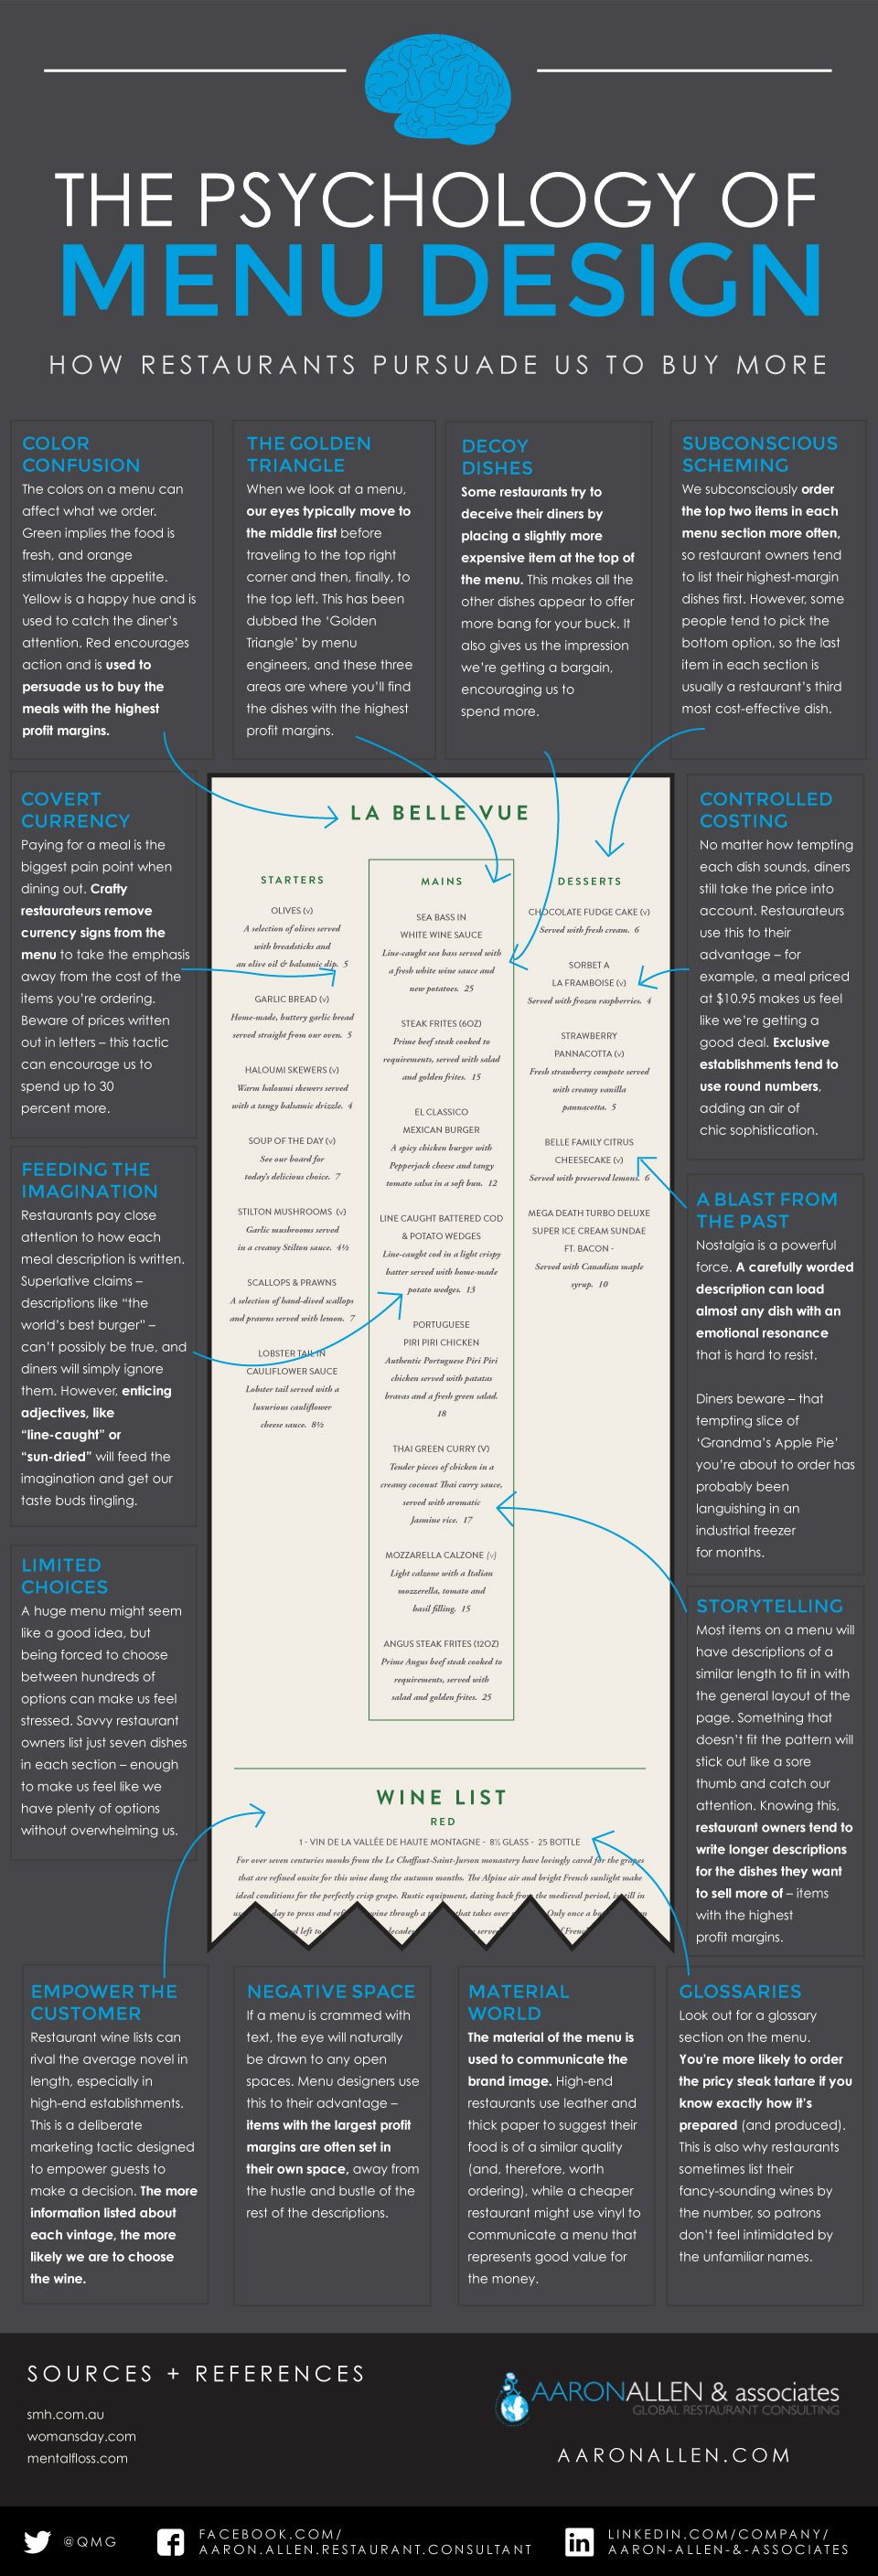 The Psychology of Menu Design